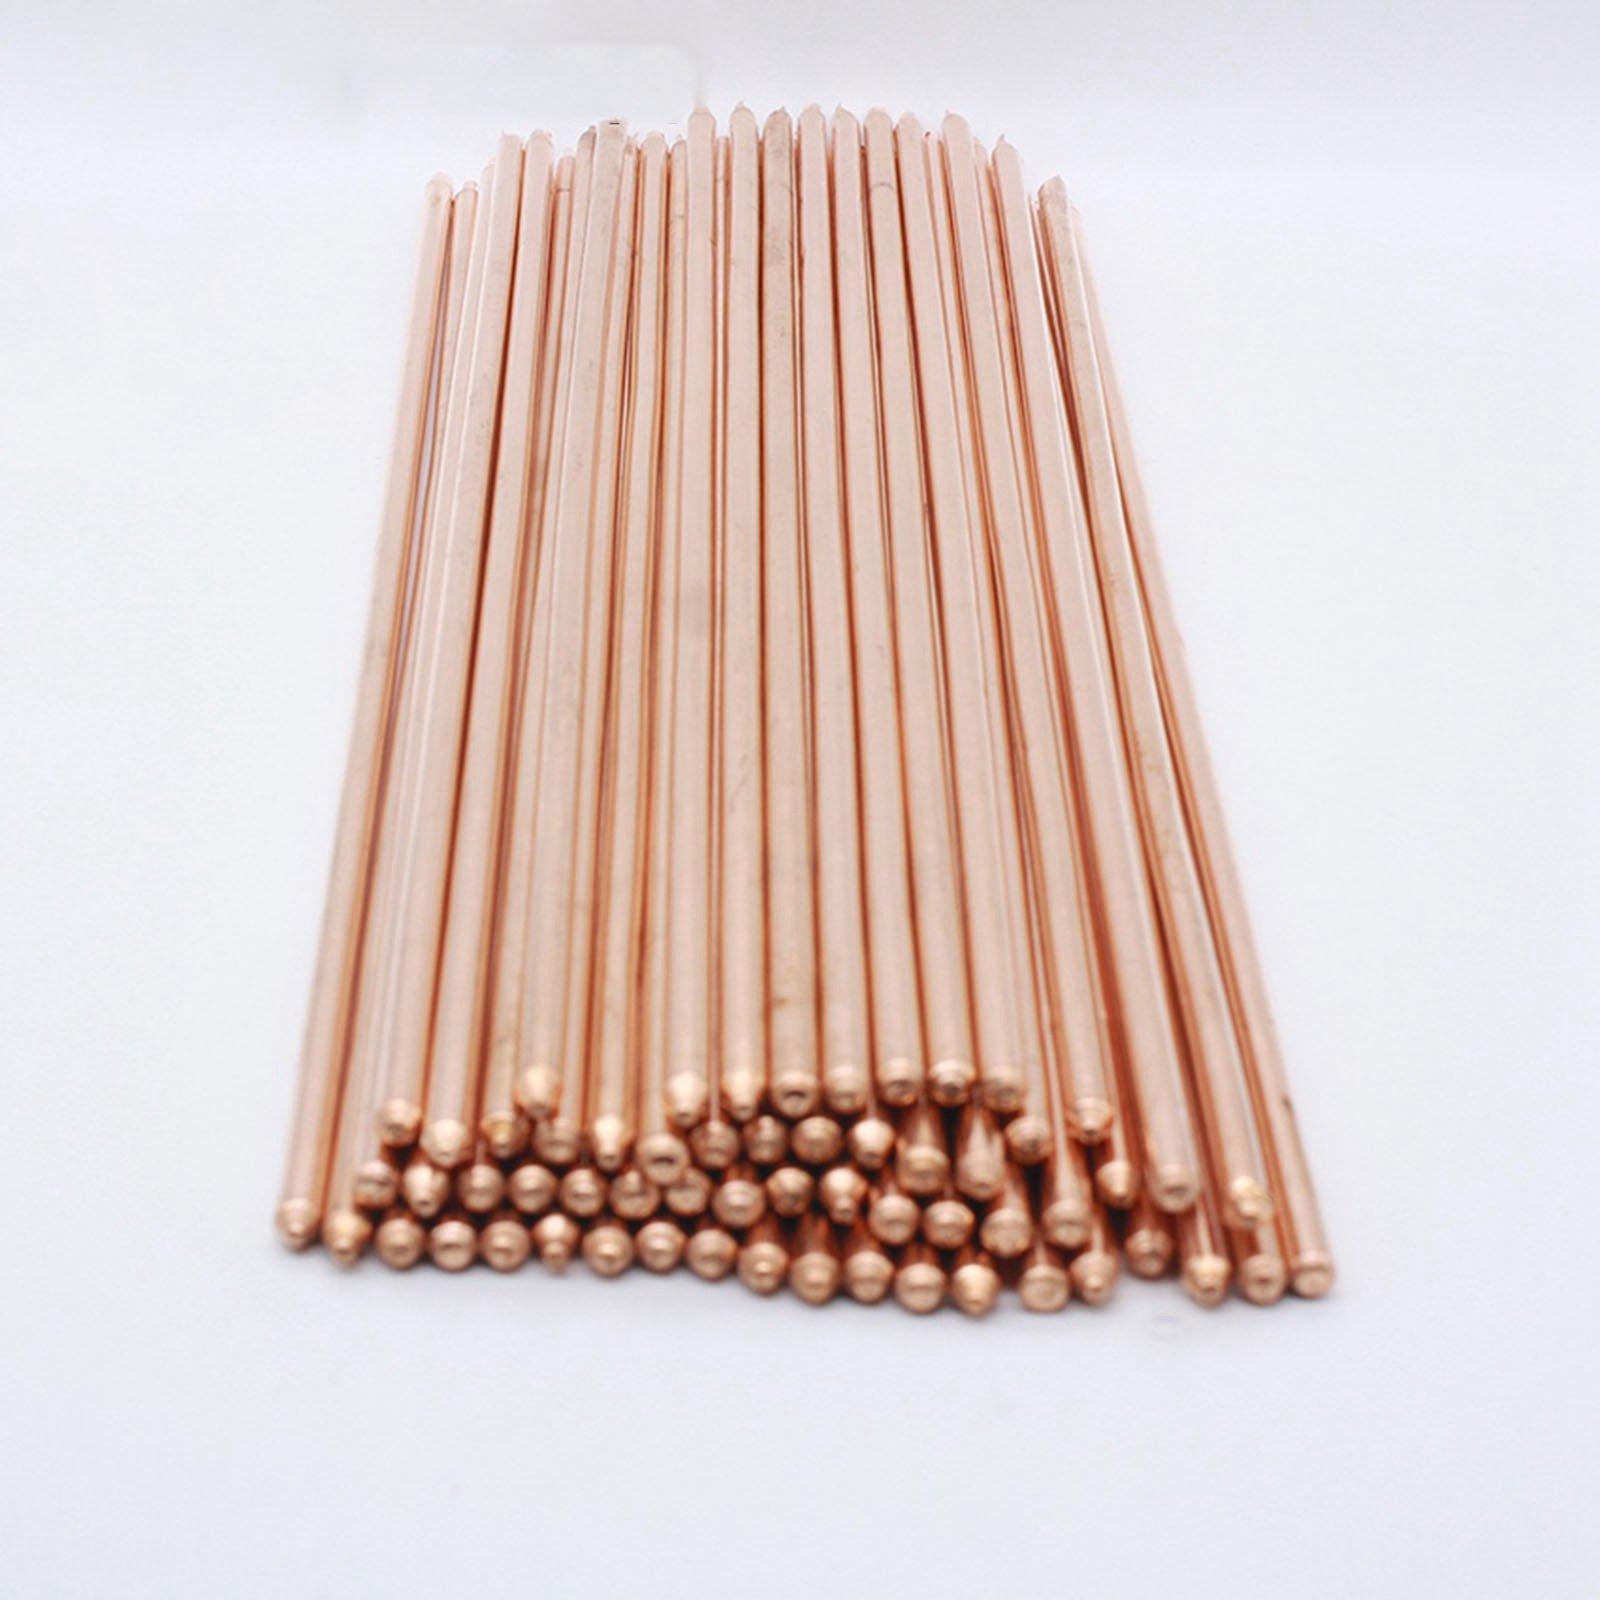 220mm 240mm Length 10mm Diameter Cooling Round Rod Copper Heatsink Heatpipe Laptop DIY CPU